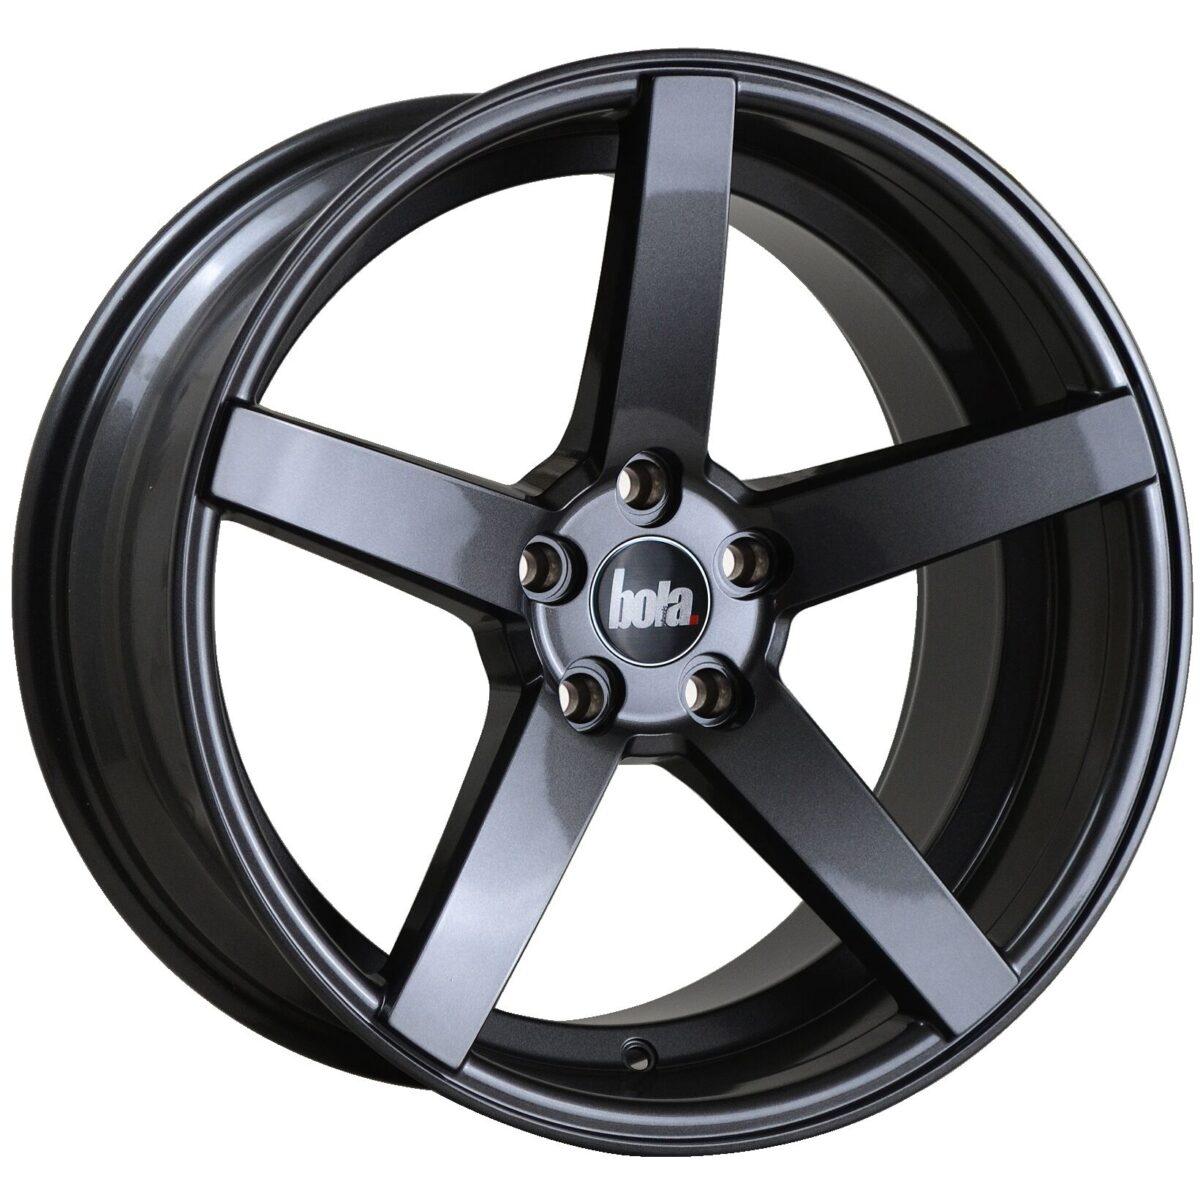 "18"" BOLA B2 Wheels - Gloss Gunmetal - VW / Audi / Mercedes - 5x112"